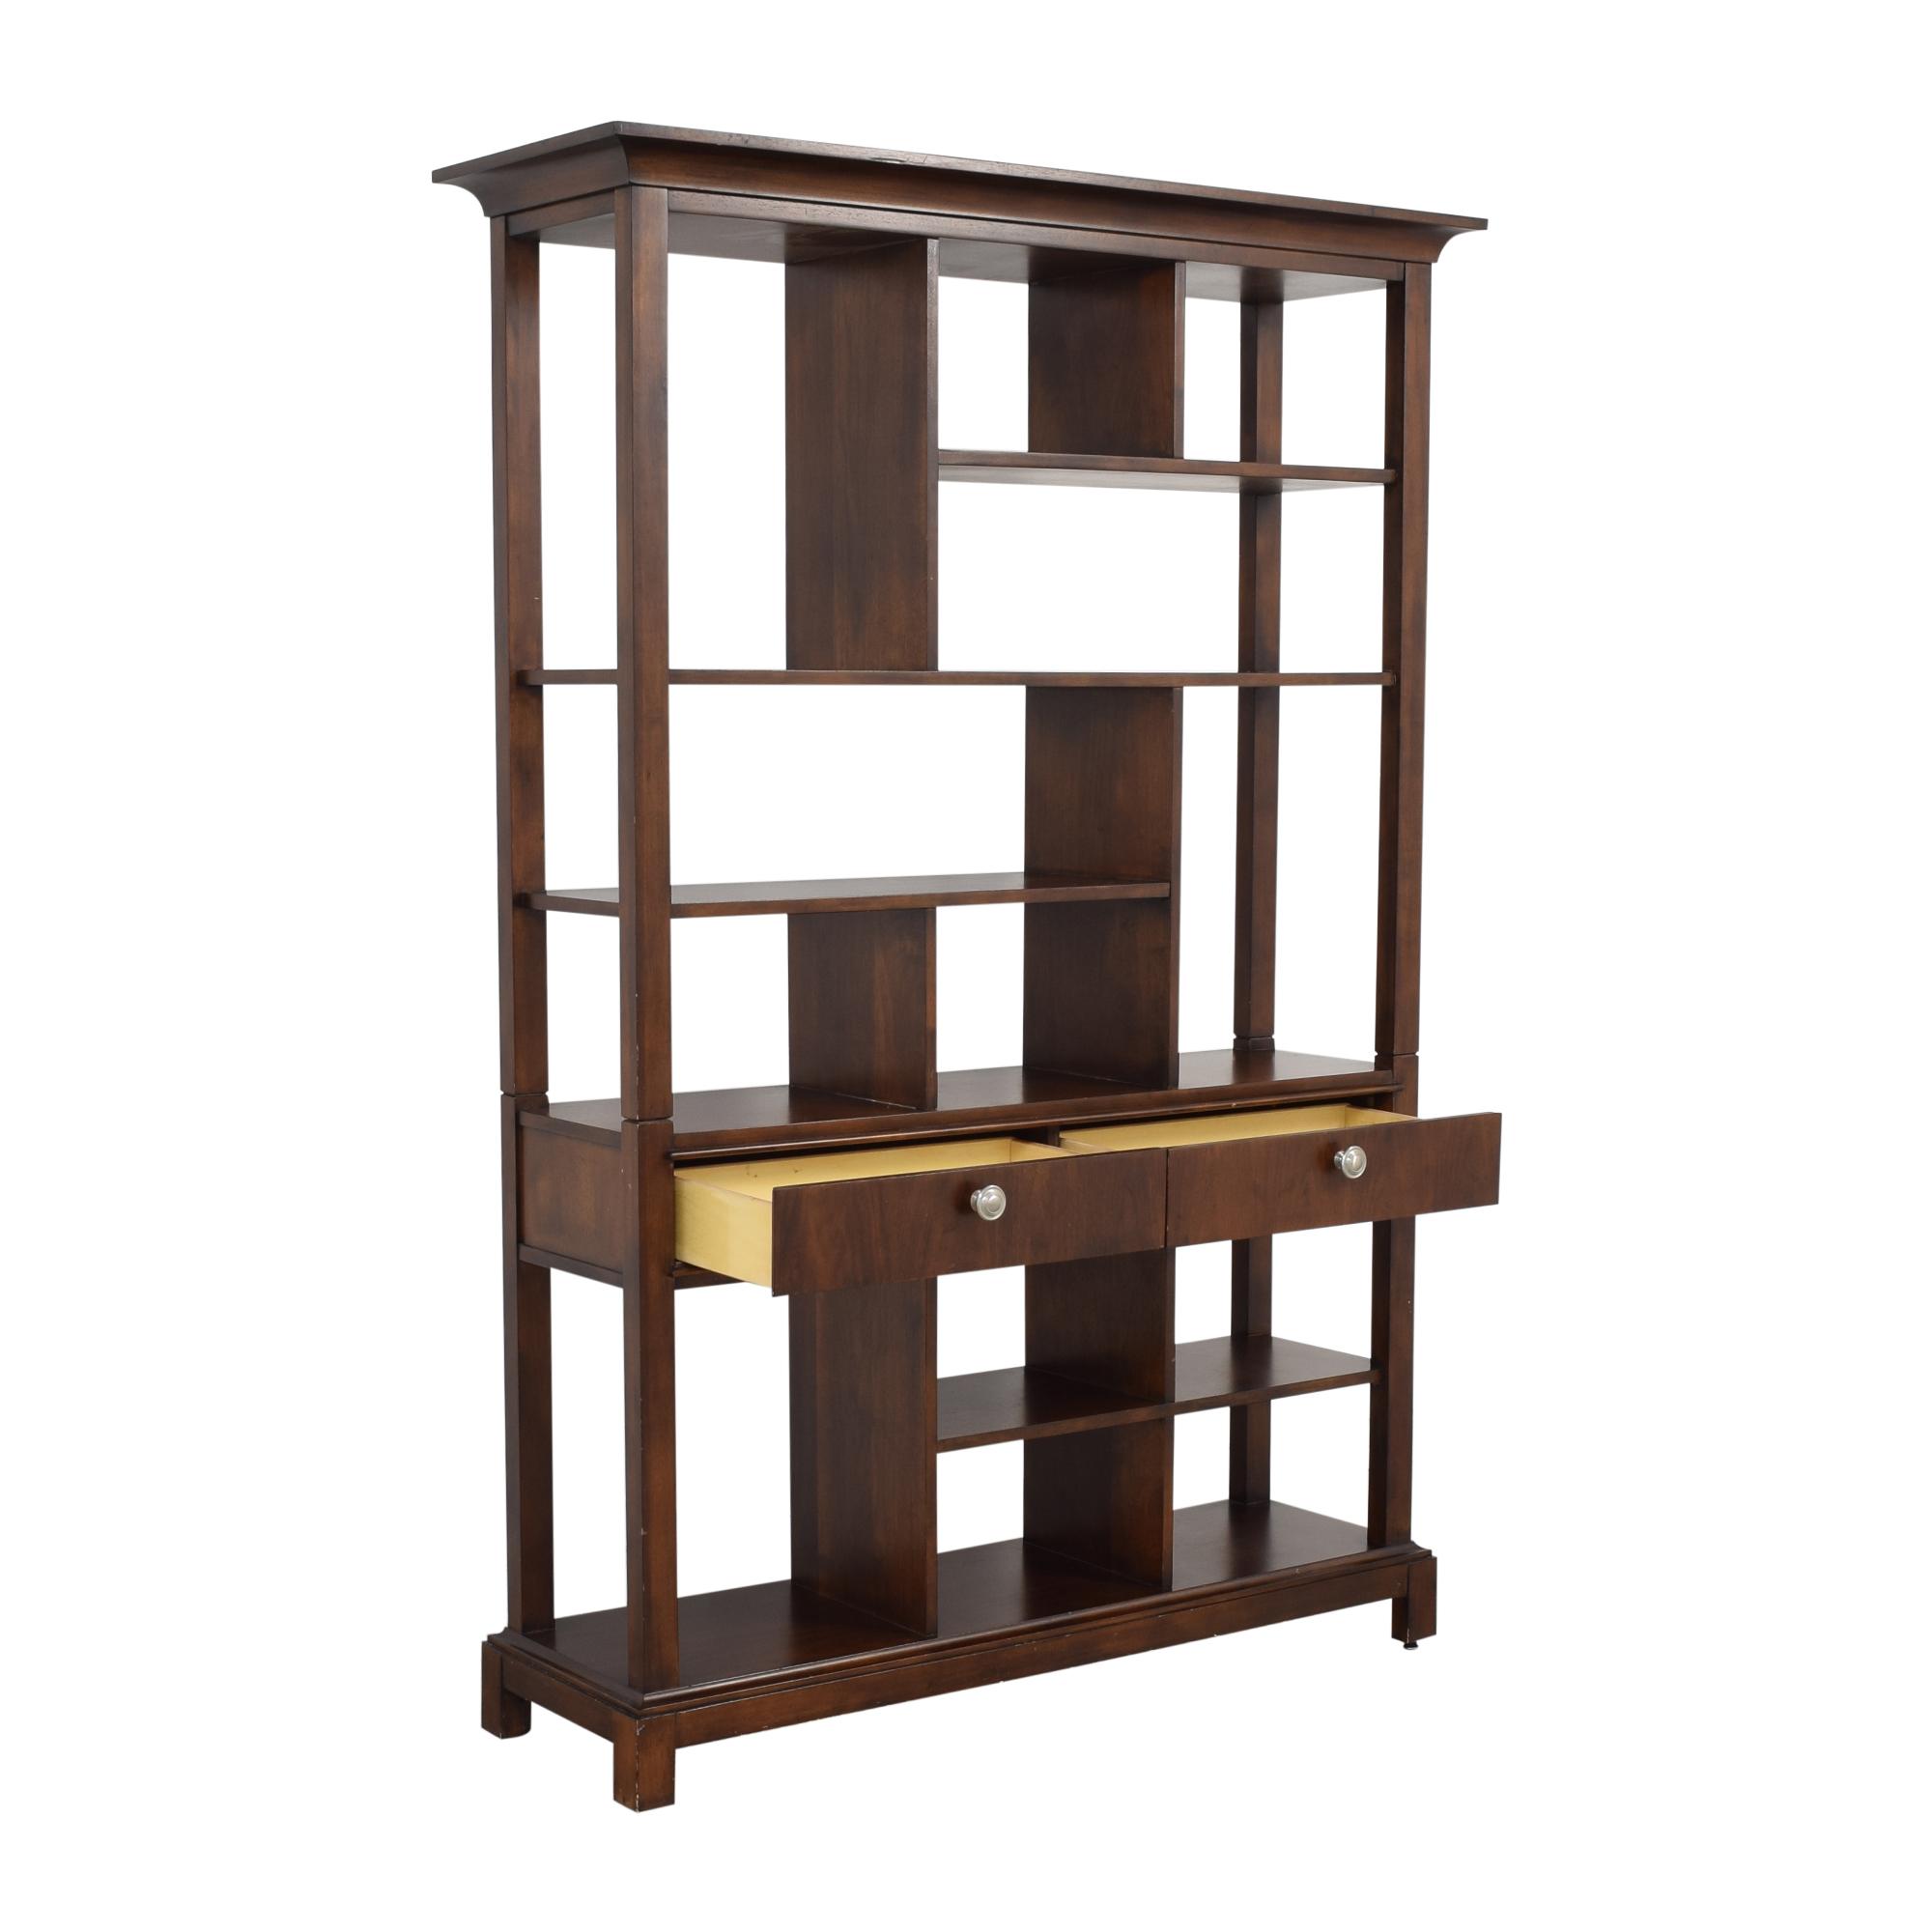 Stanley Furniture Etagere Bookcase sale